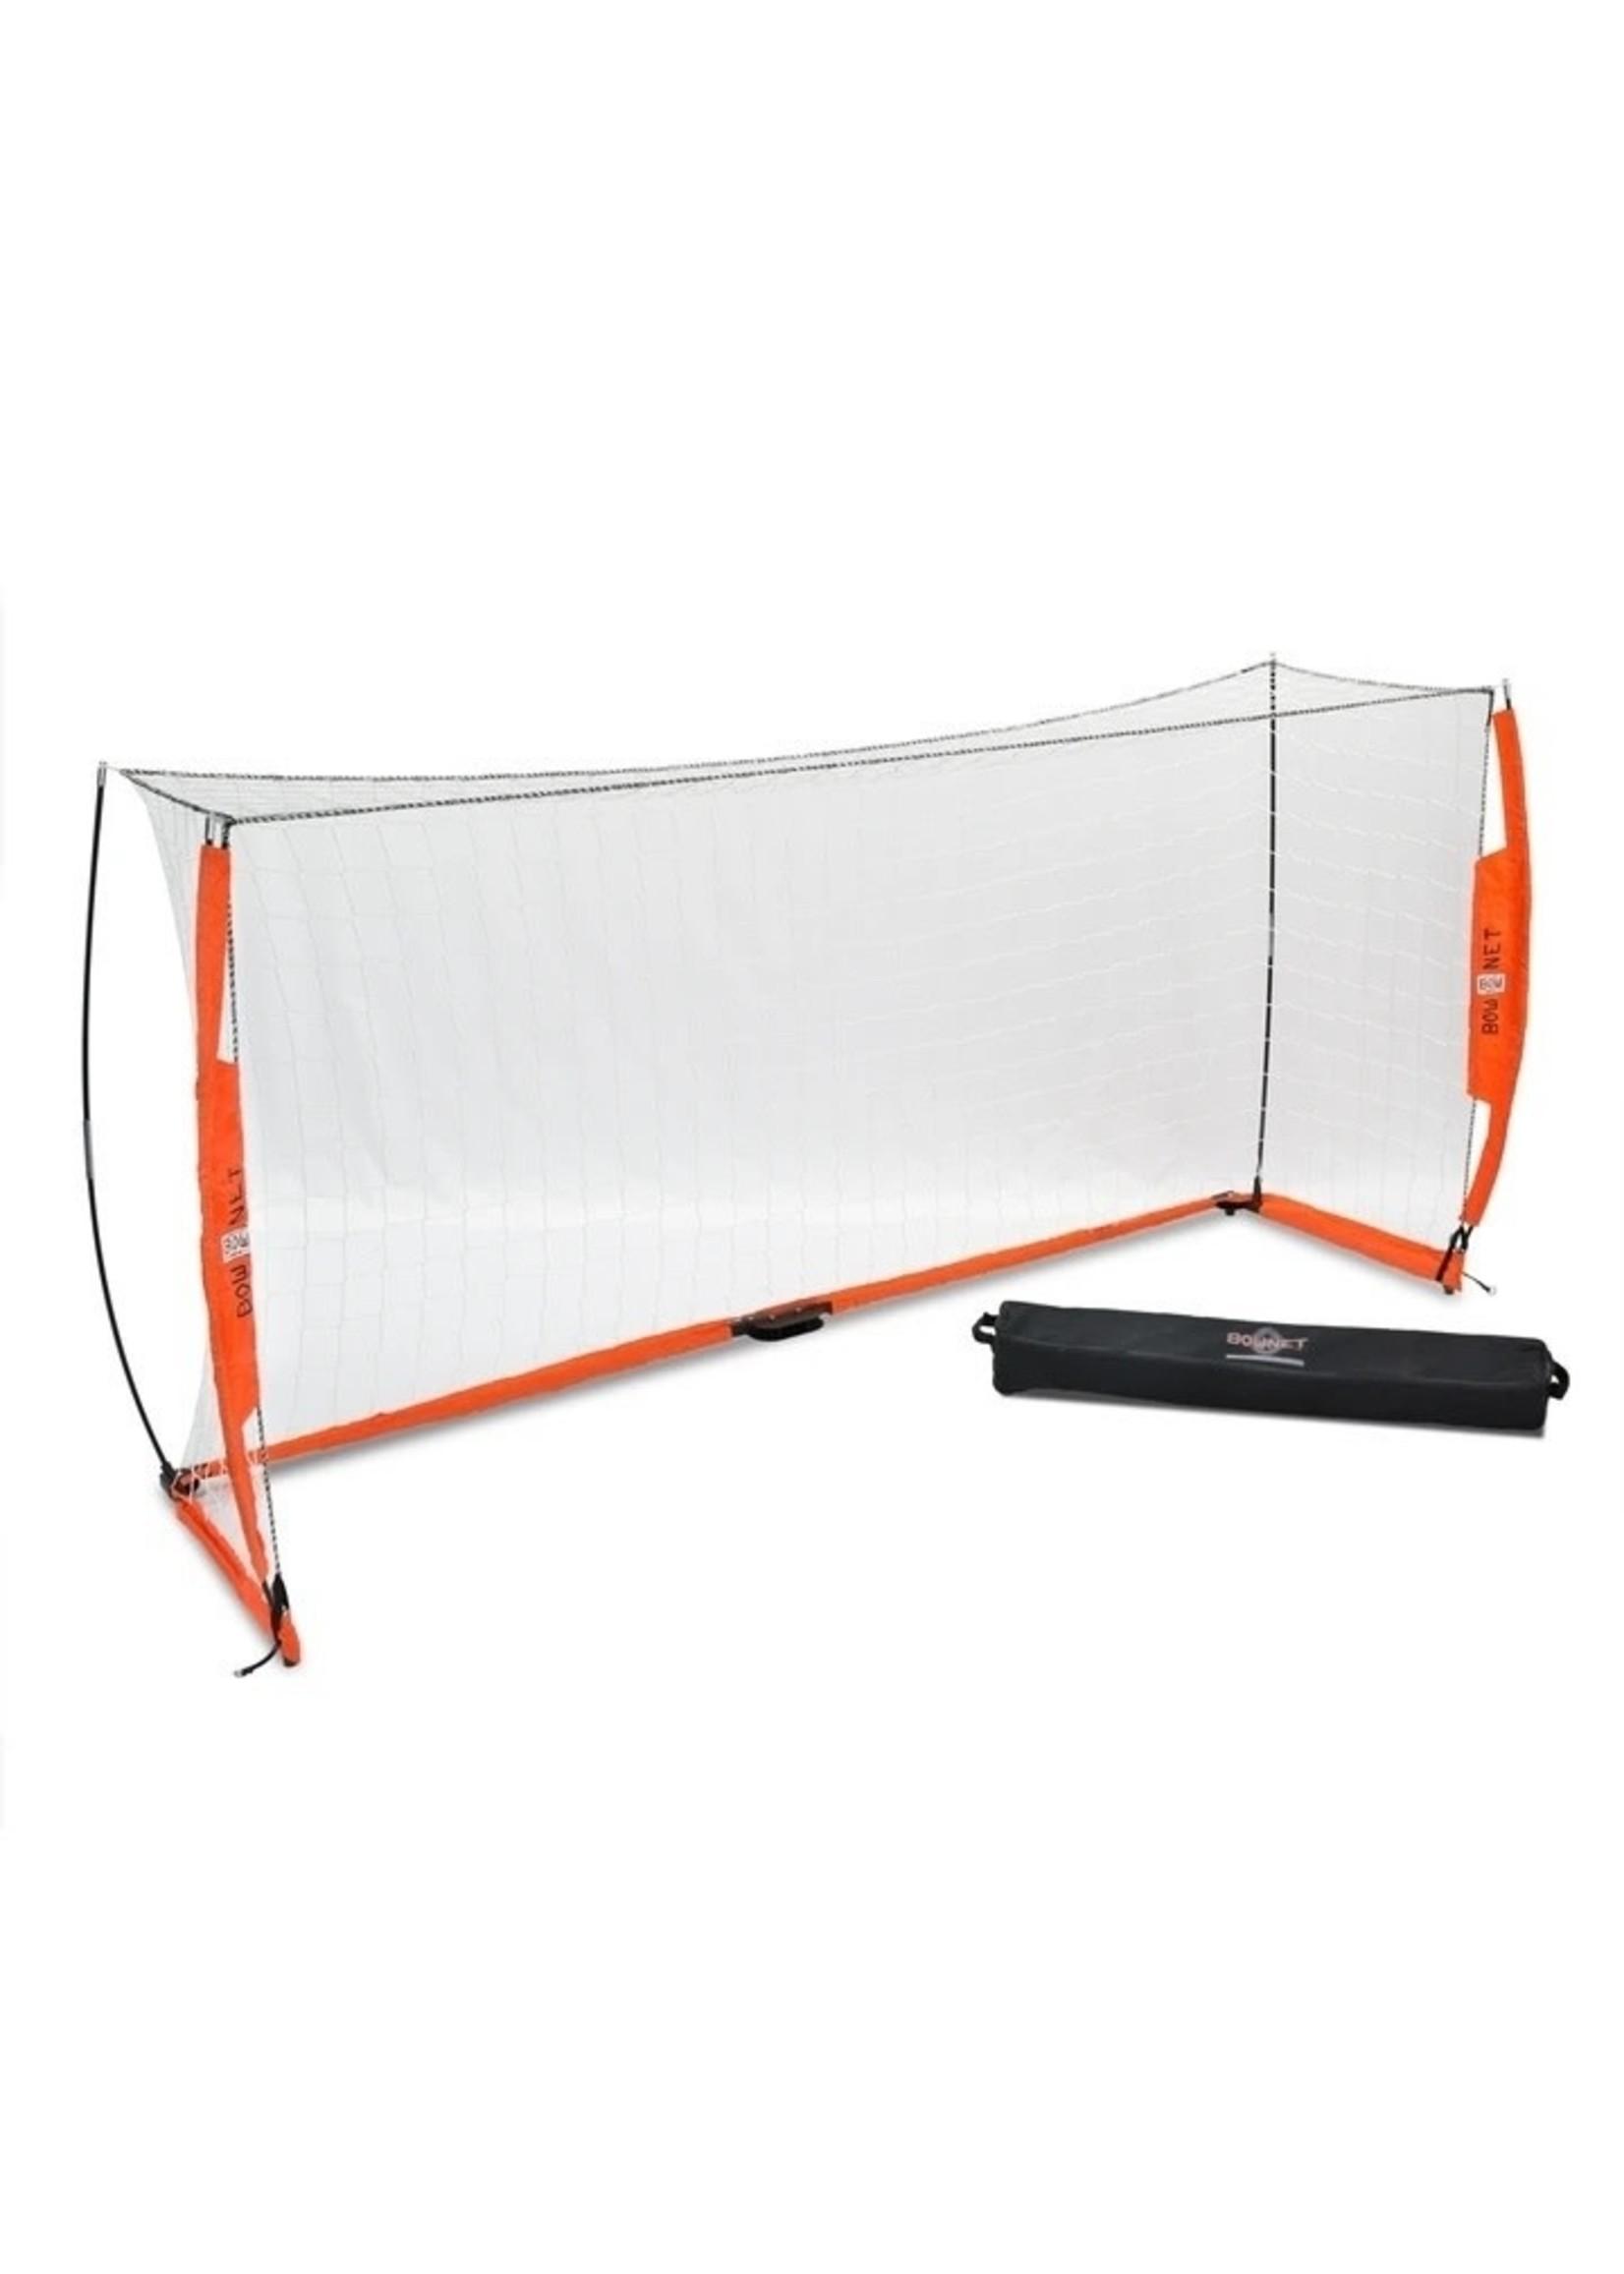 Bownet Soccer Goal 5x10